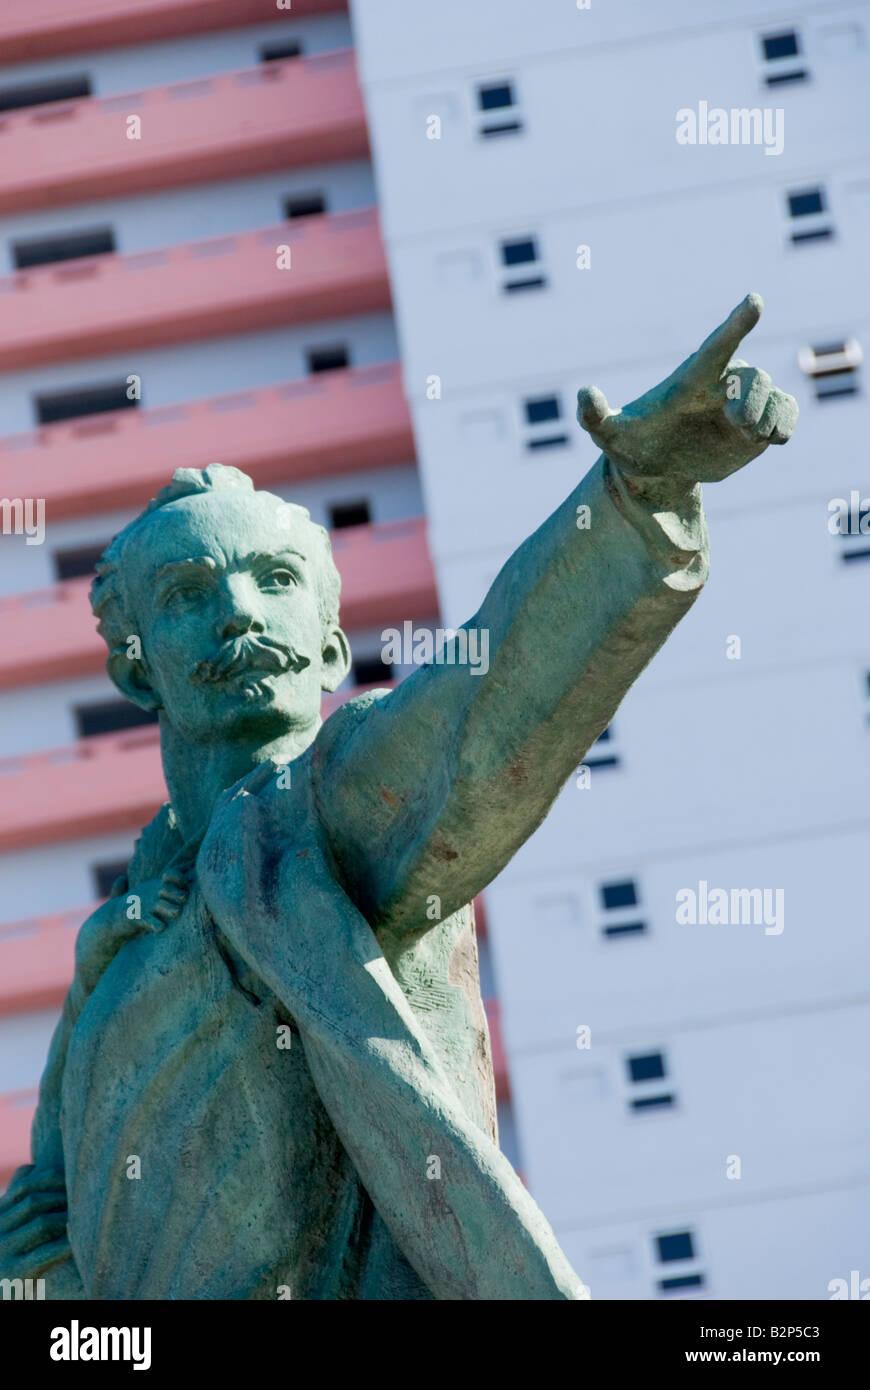 Statue of Jose Marti with Elian Gonzalez at the Jose Mart Anti Imperialist Plaza Havana Cuba - Stock Image